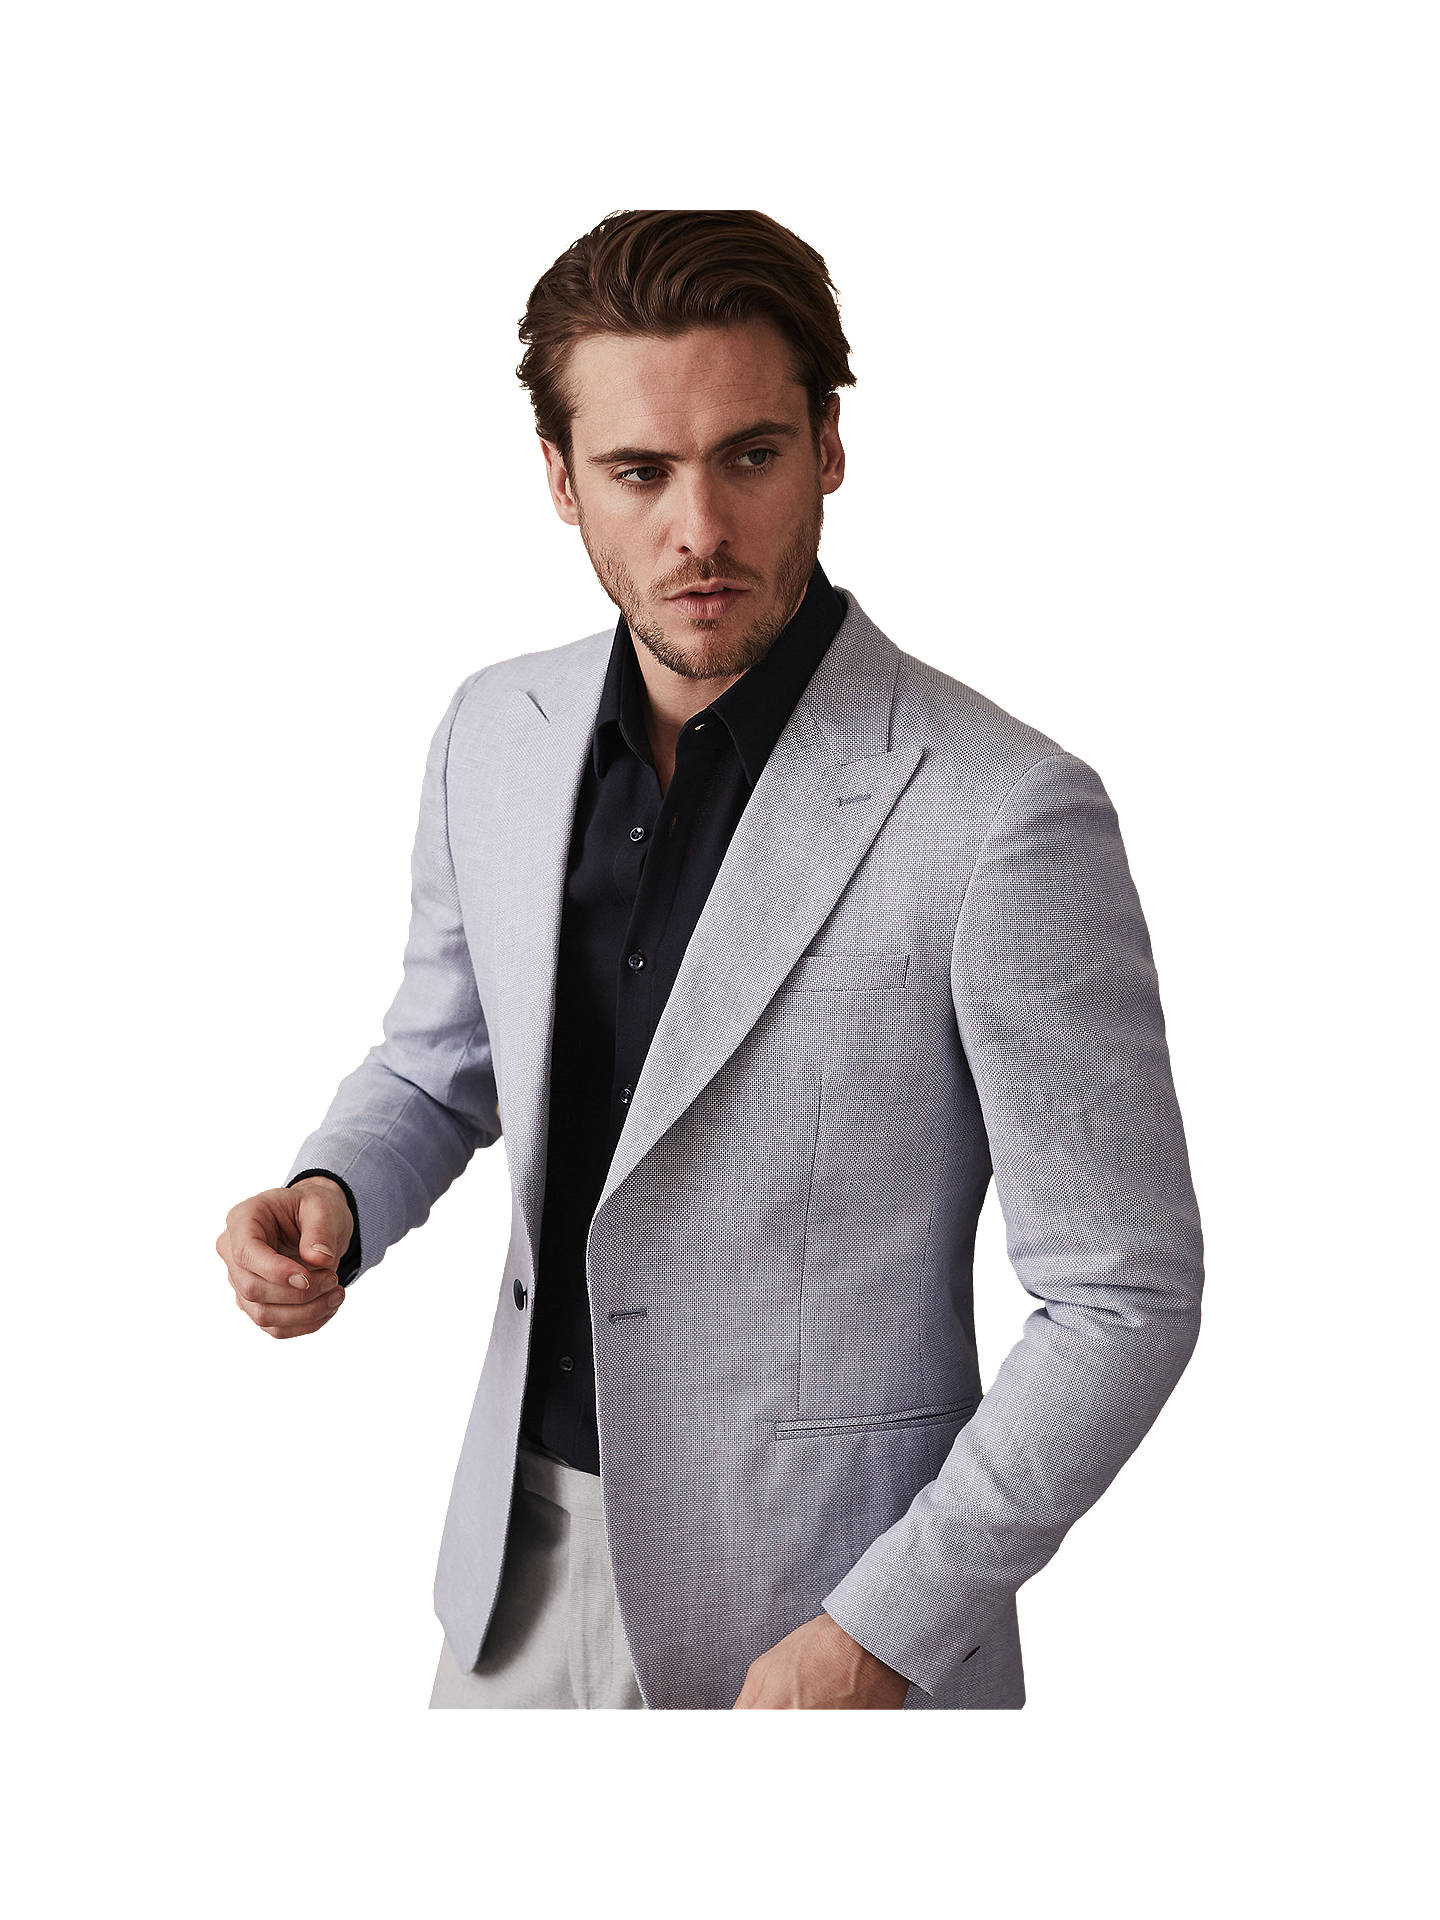 745dc91faaaad Reiss Jaydon Slim Fit Blazer, Light Grey at John Lewis & Partners